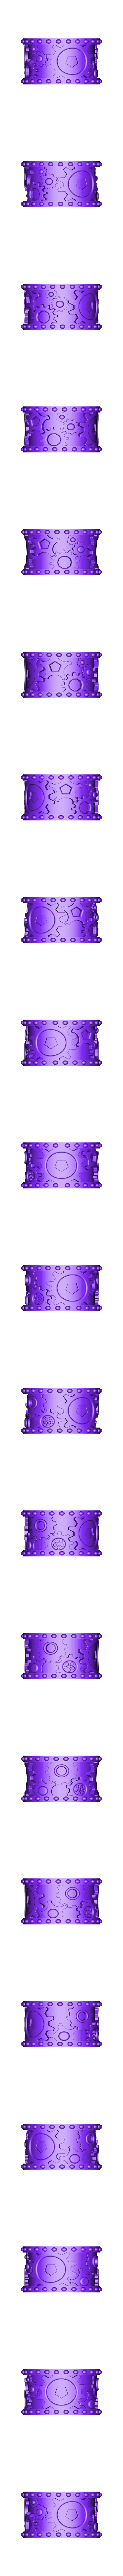 Argolla engranes boleana.STL Download STL file Gear ring • 3D printing design, JHMPlateria